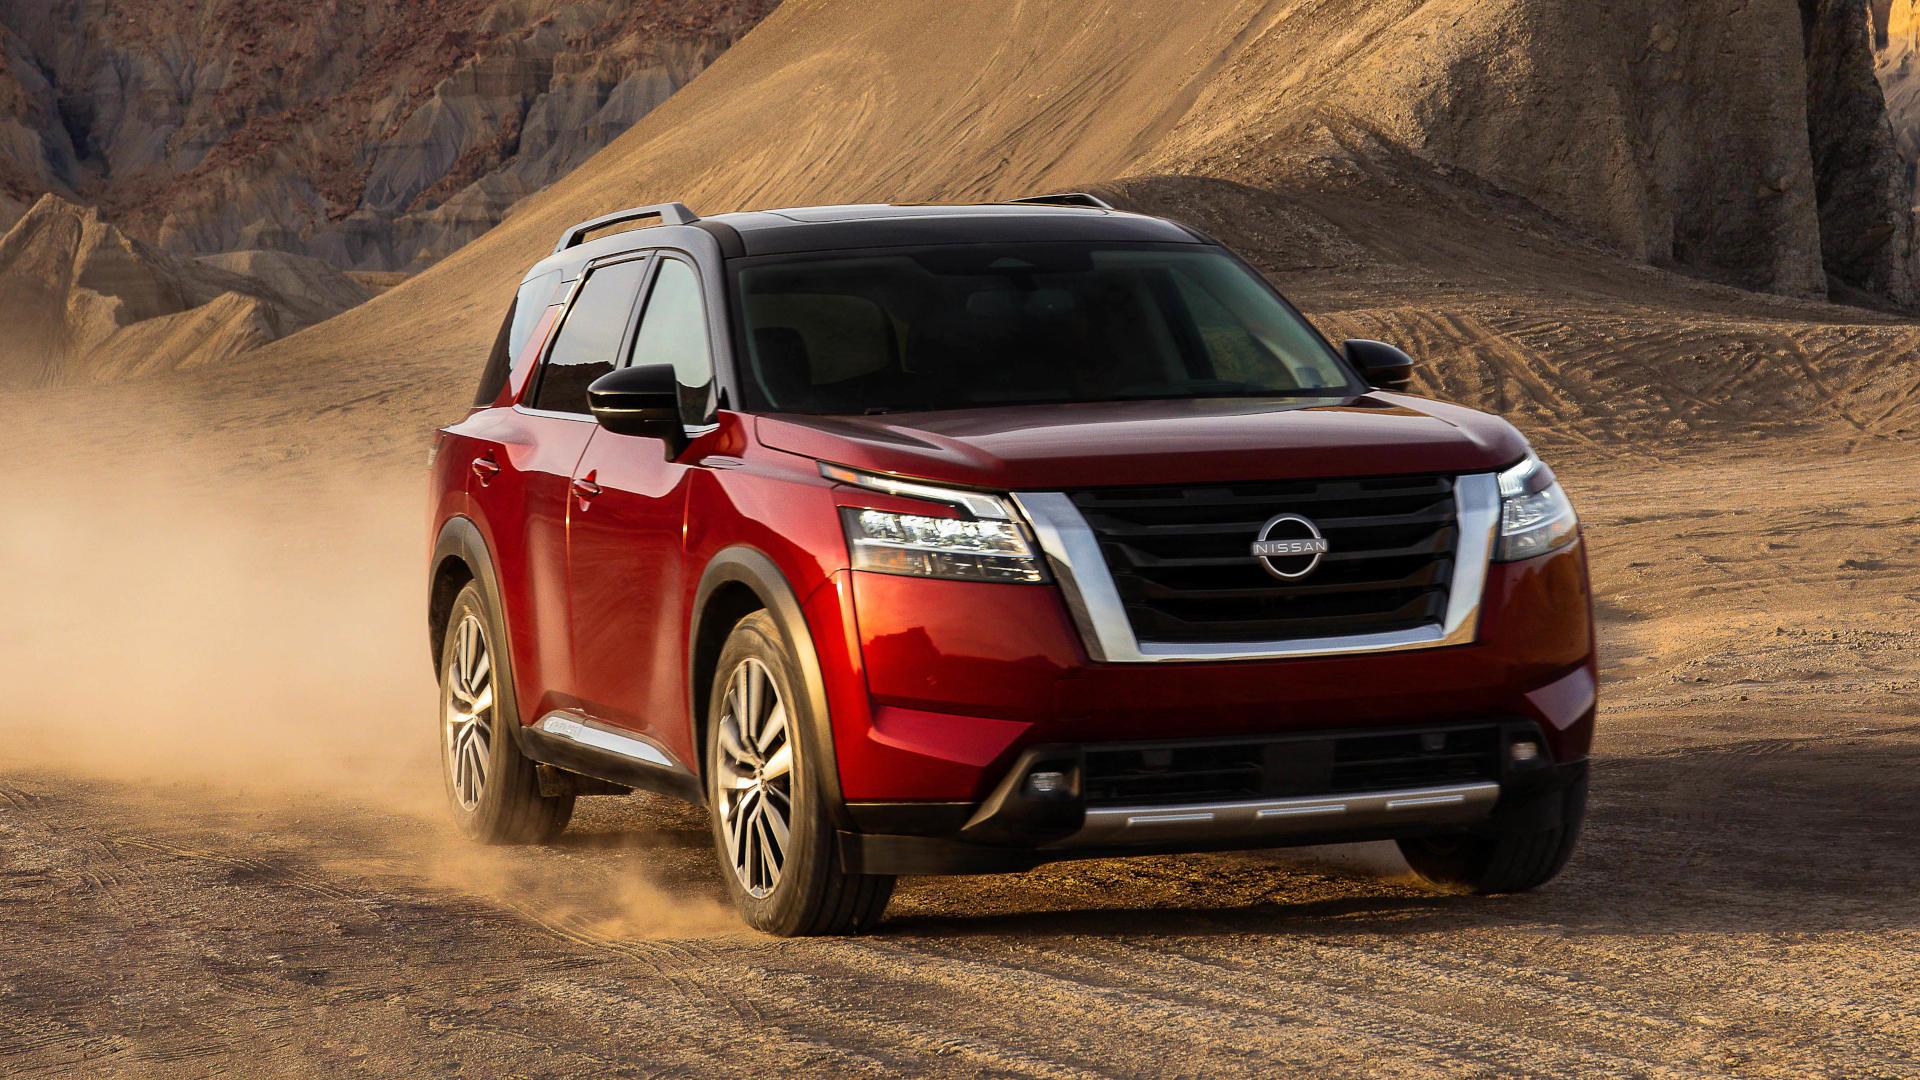 The Nissan Pathfinder